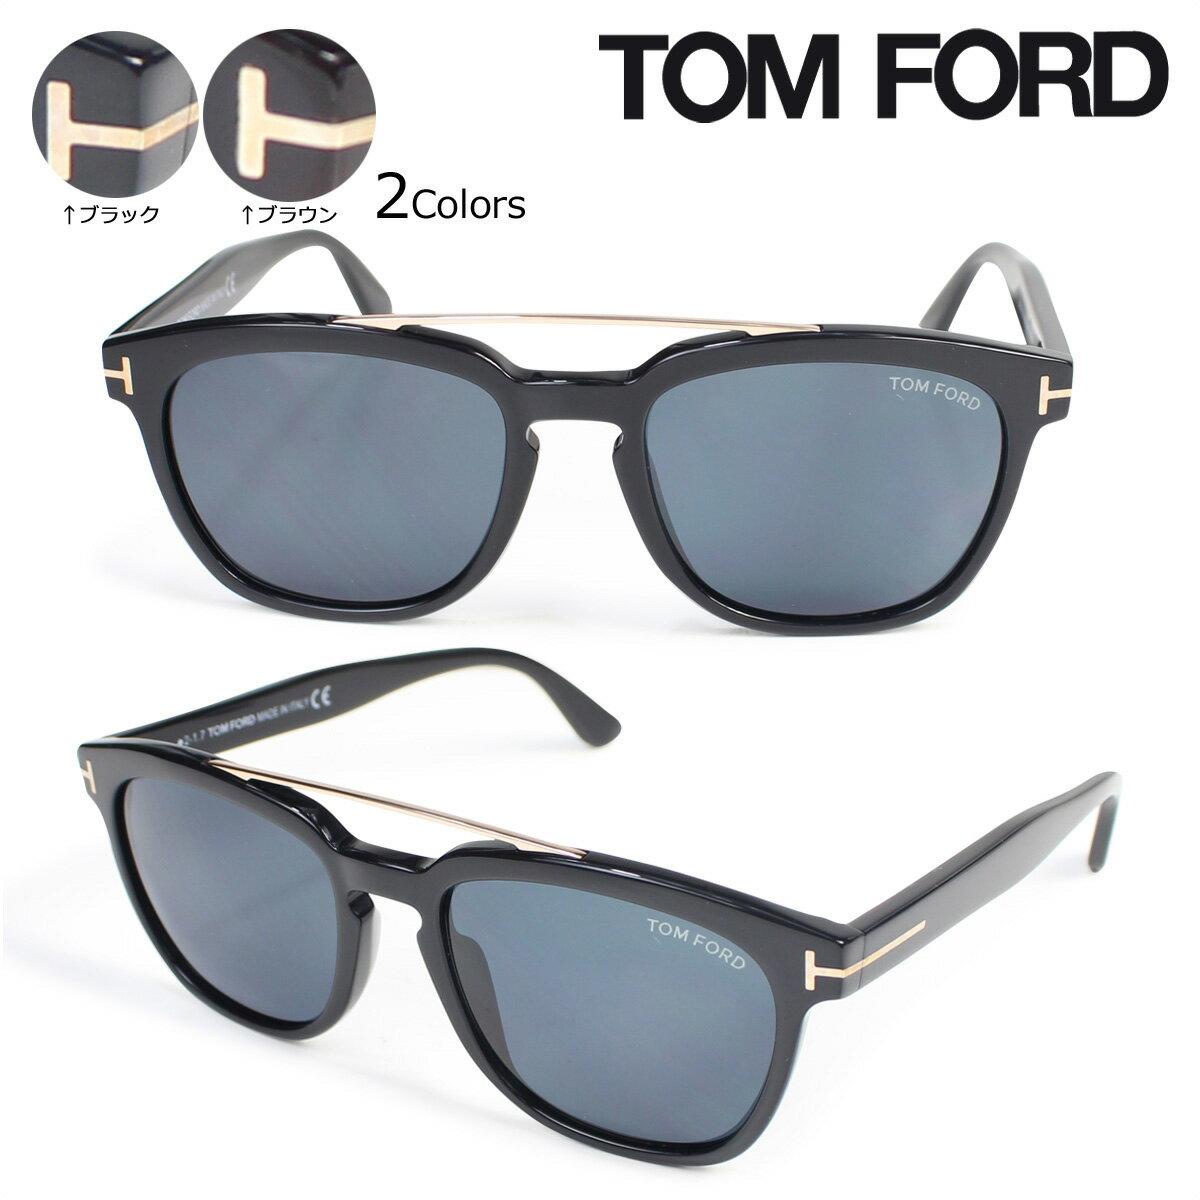 TOM FORD トムフォード サングラス メガネ メンズ レディース アイウェア FT0516 HOLT SUNGLASSES 2カラー 【決算セール】